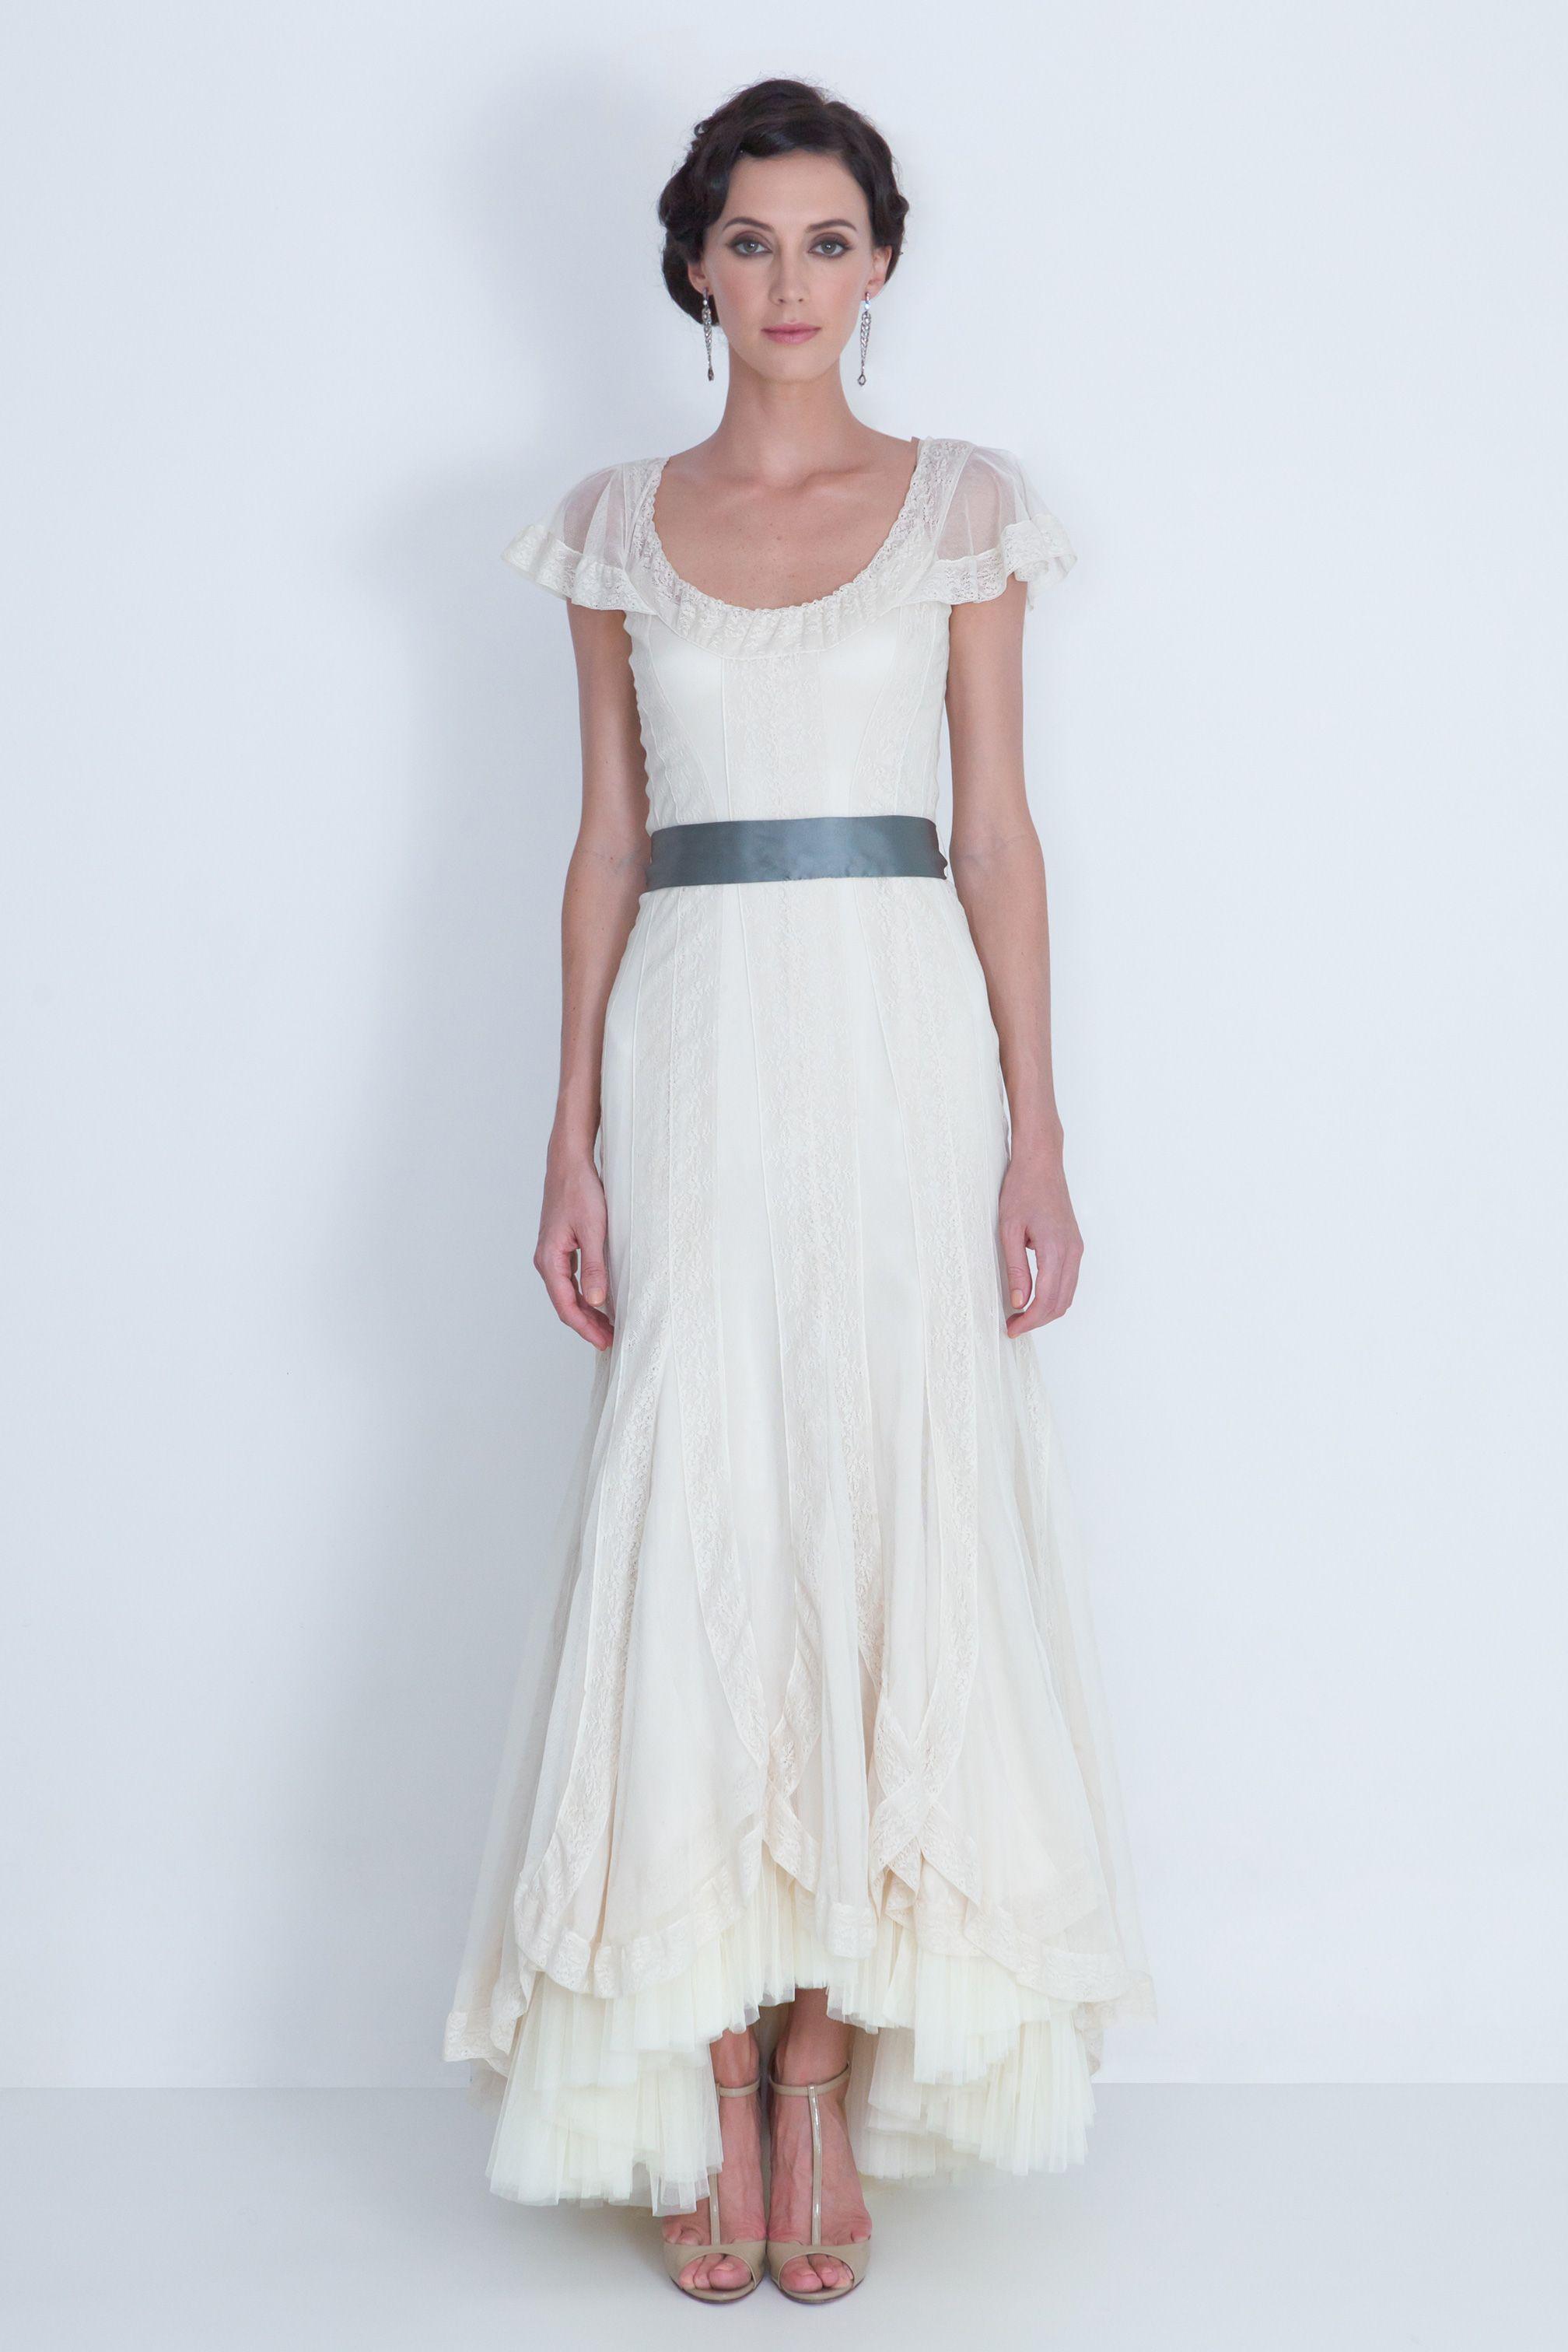 Wedding dresses downtown la  la caida  Los Vestidos  Pinterest  Neckline Gowns and Bridal